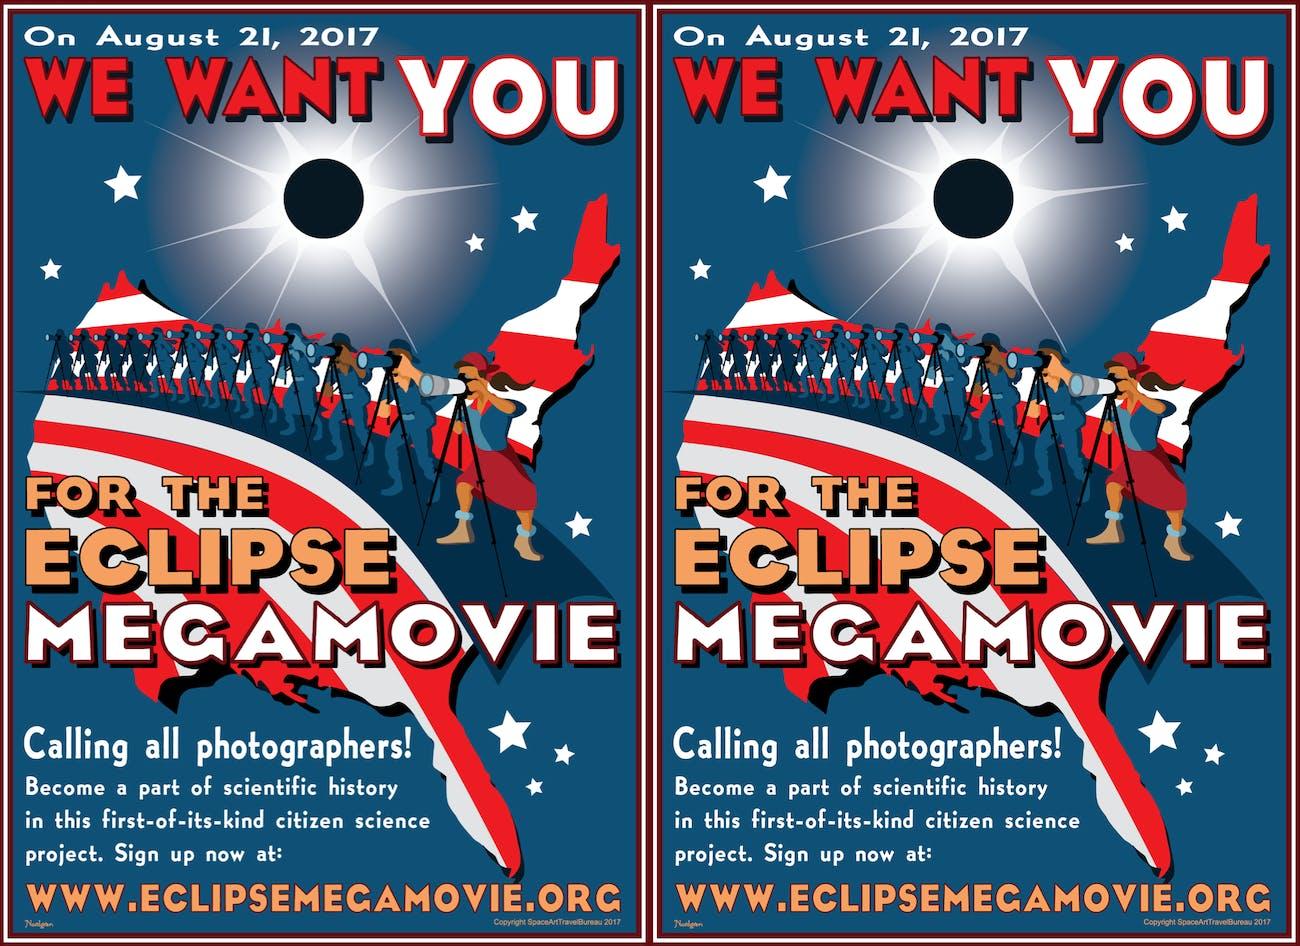 solar eclipse megamovie scientists